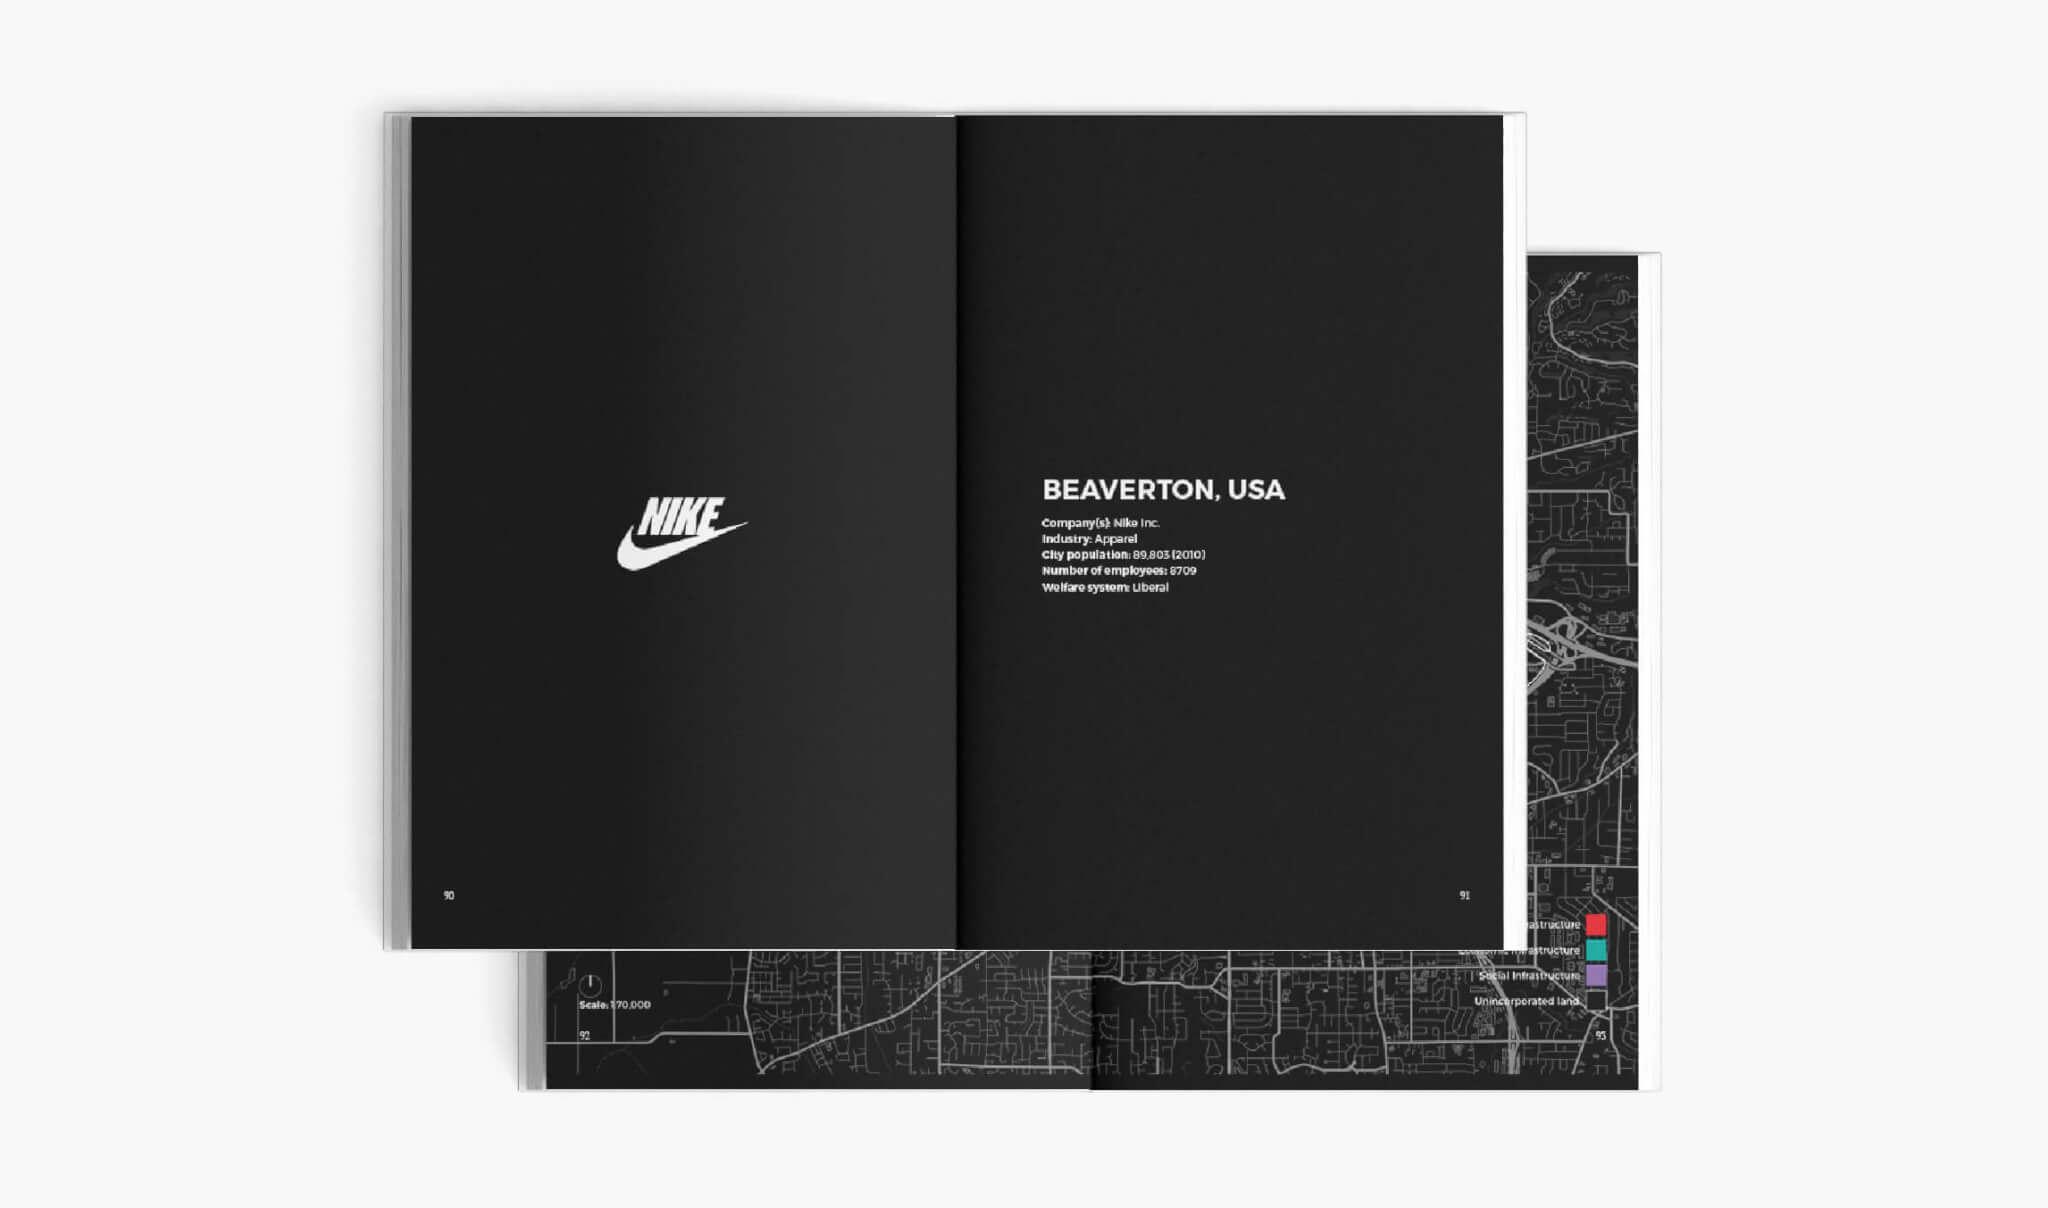 studio-interrobang-corporate-landscapes-mapping10